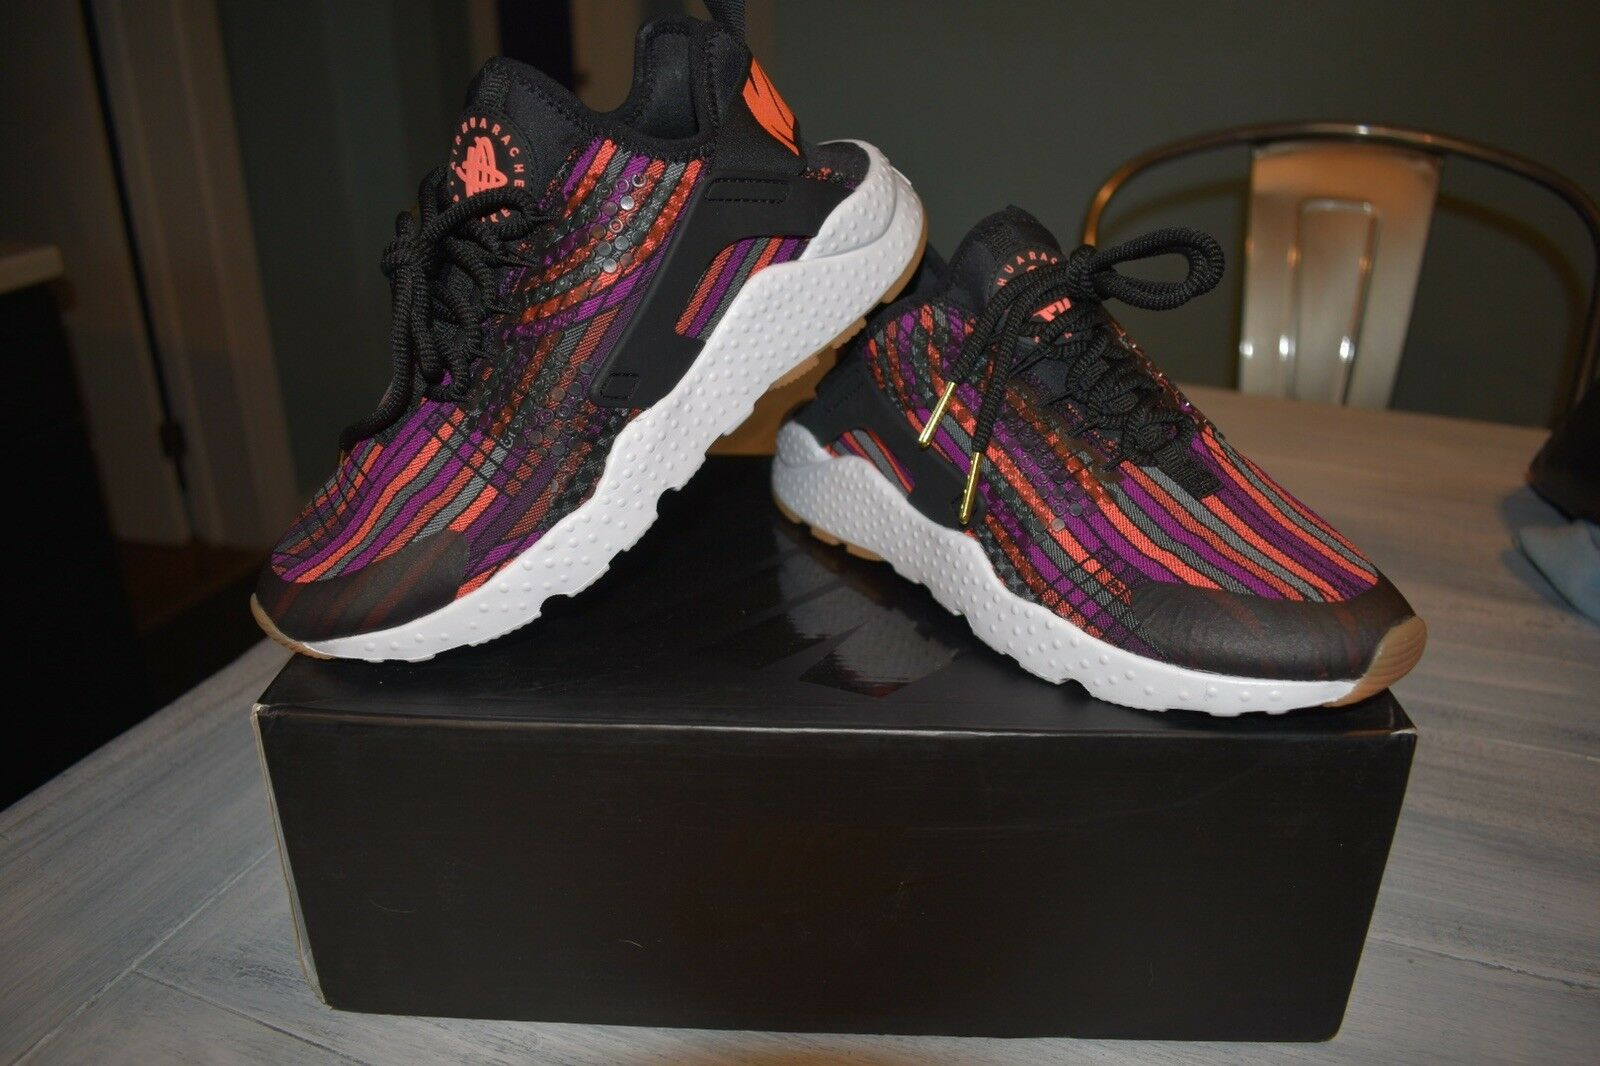 Nike Women's Prestos-Jacquard Edition  Cheap and fashionable